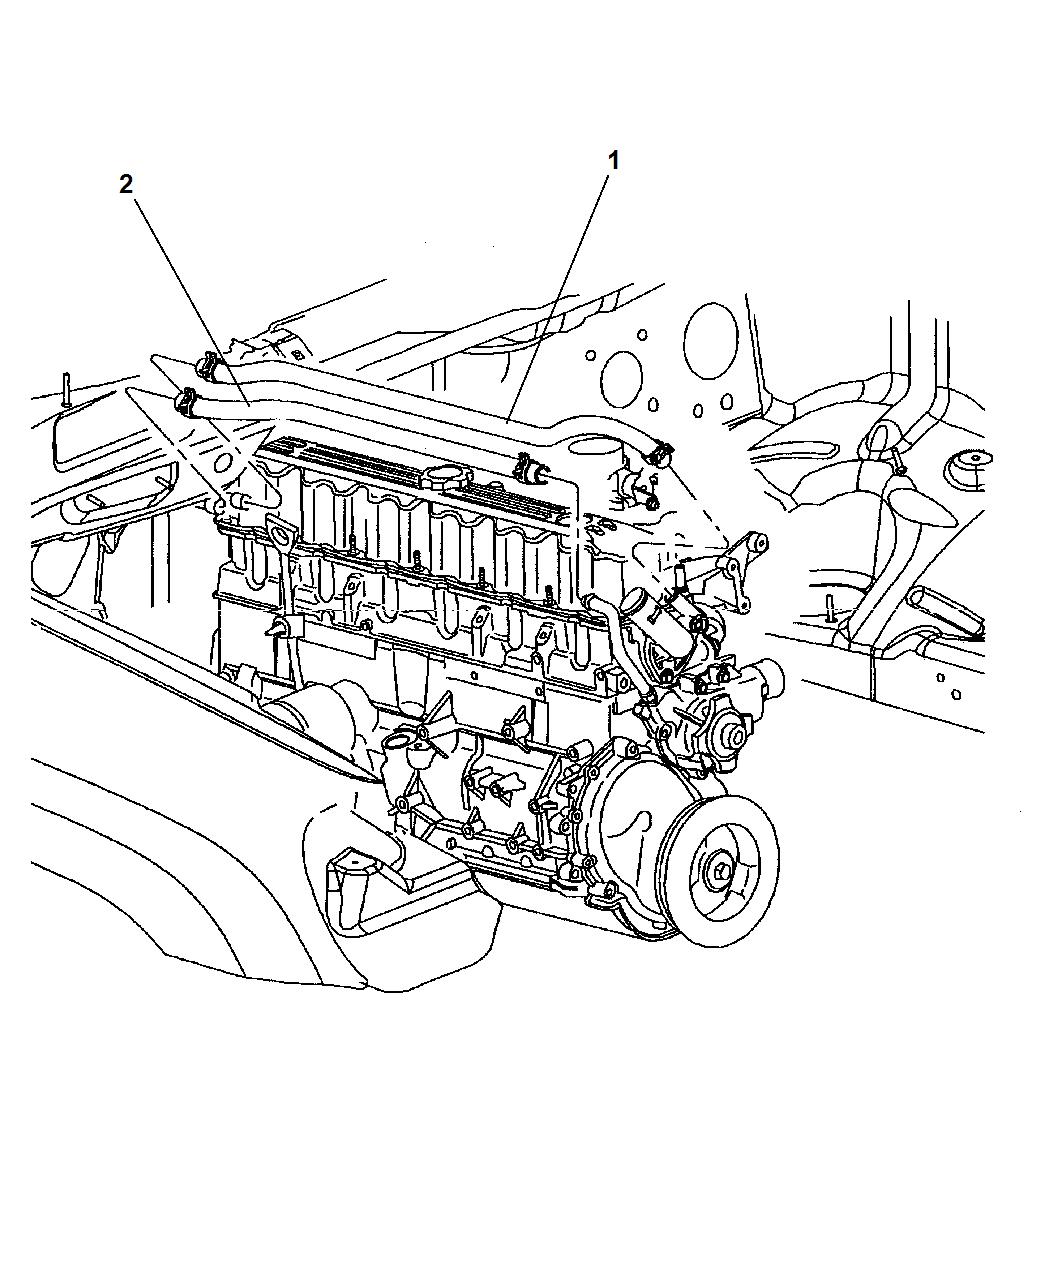 Tr 6185 2004 Jeep Grand Cherokee Heater Hoses Diagram Download Diagram